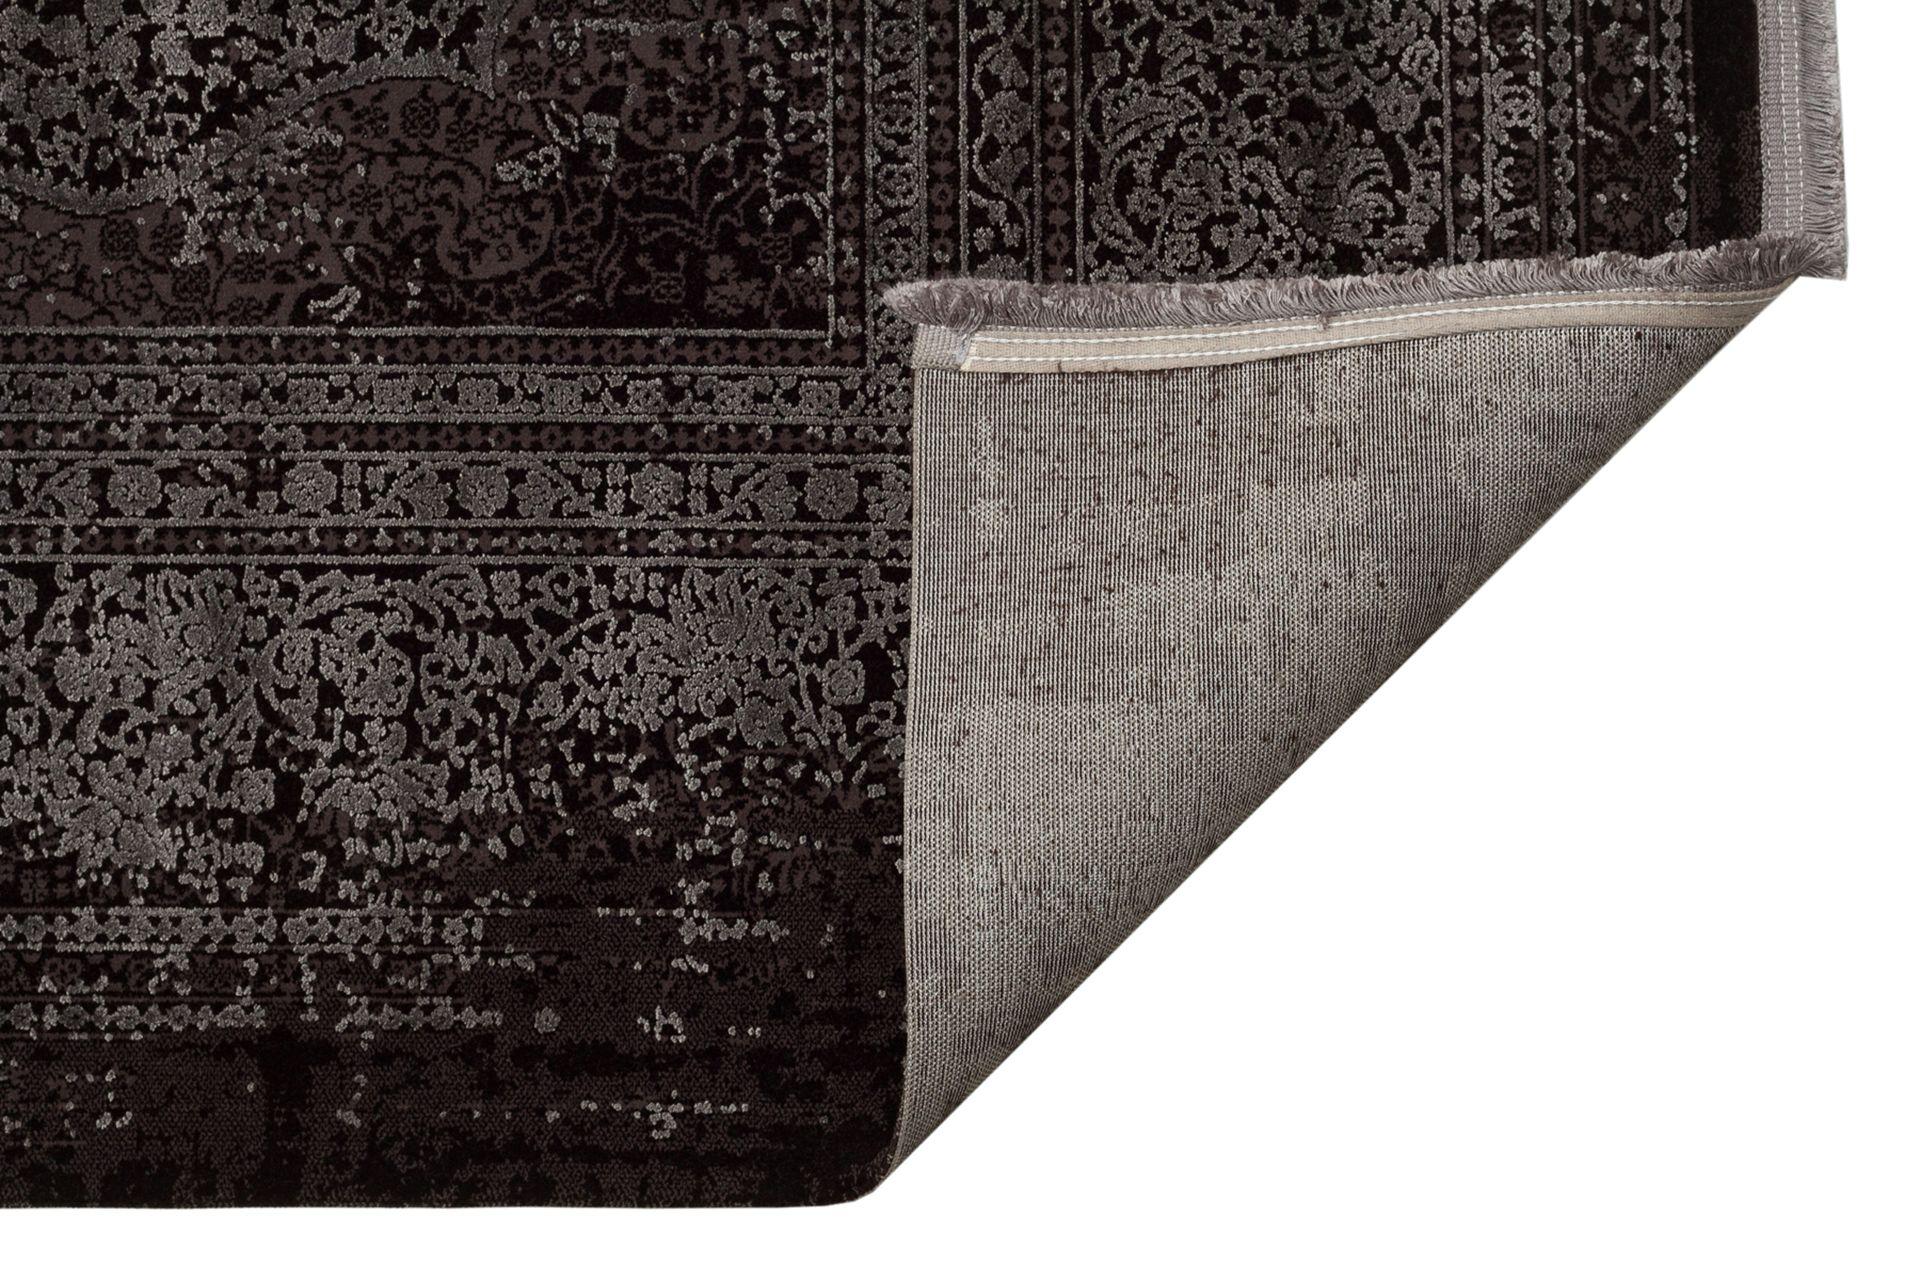 ANADOLU AD 01 ANTRASİT GRİ KLASİK DESENLİ SALON HALISI 300X400